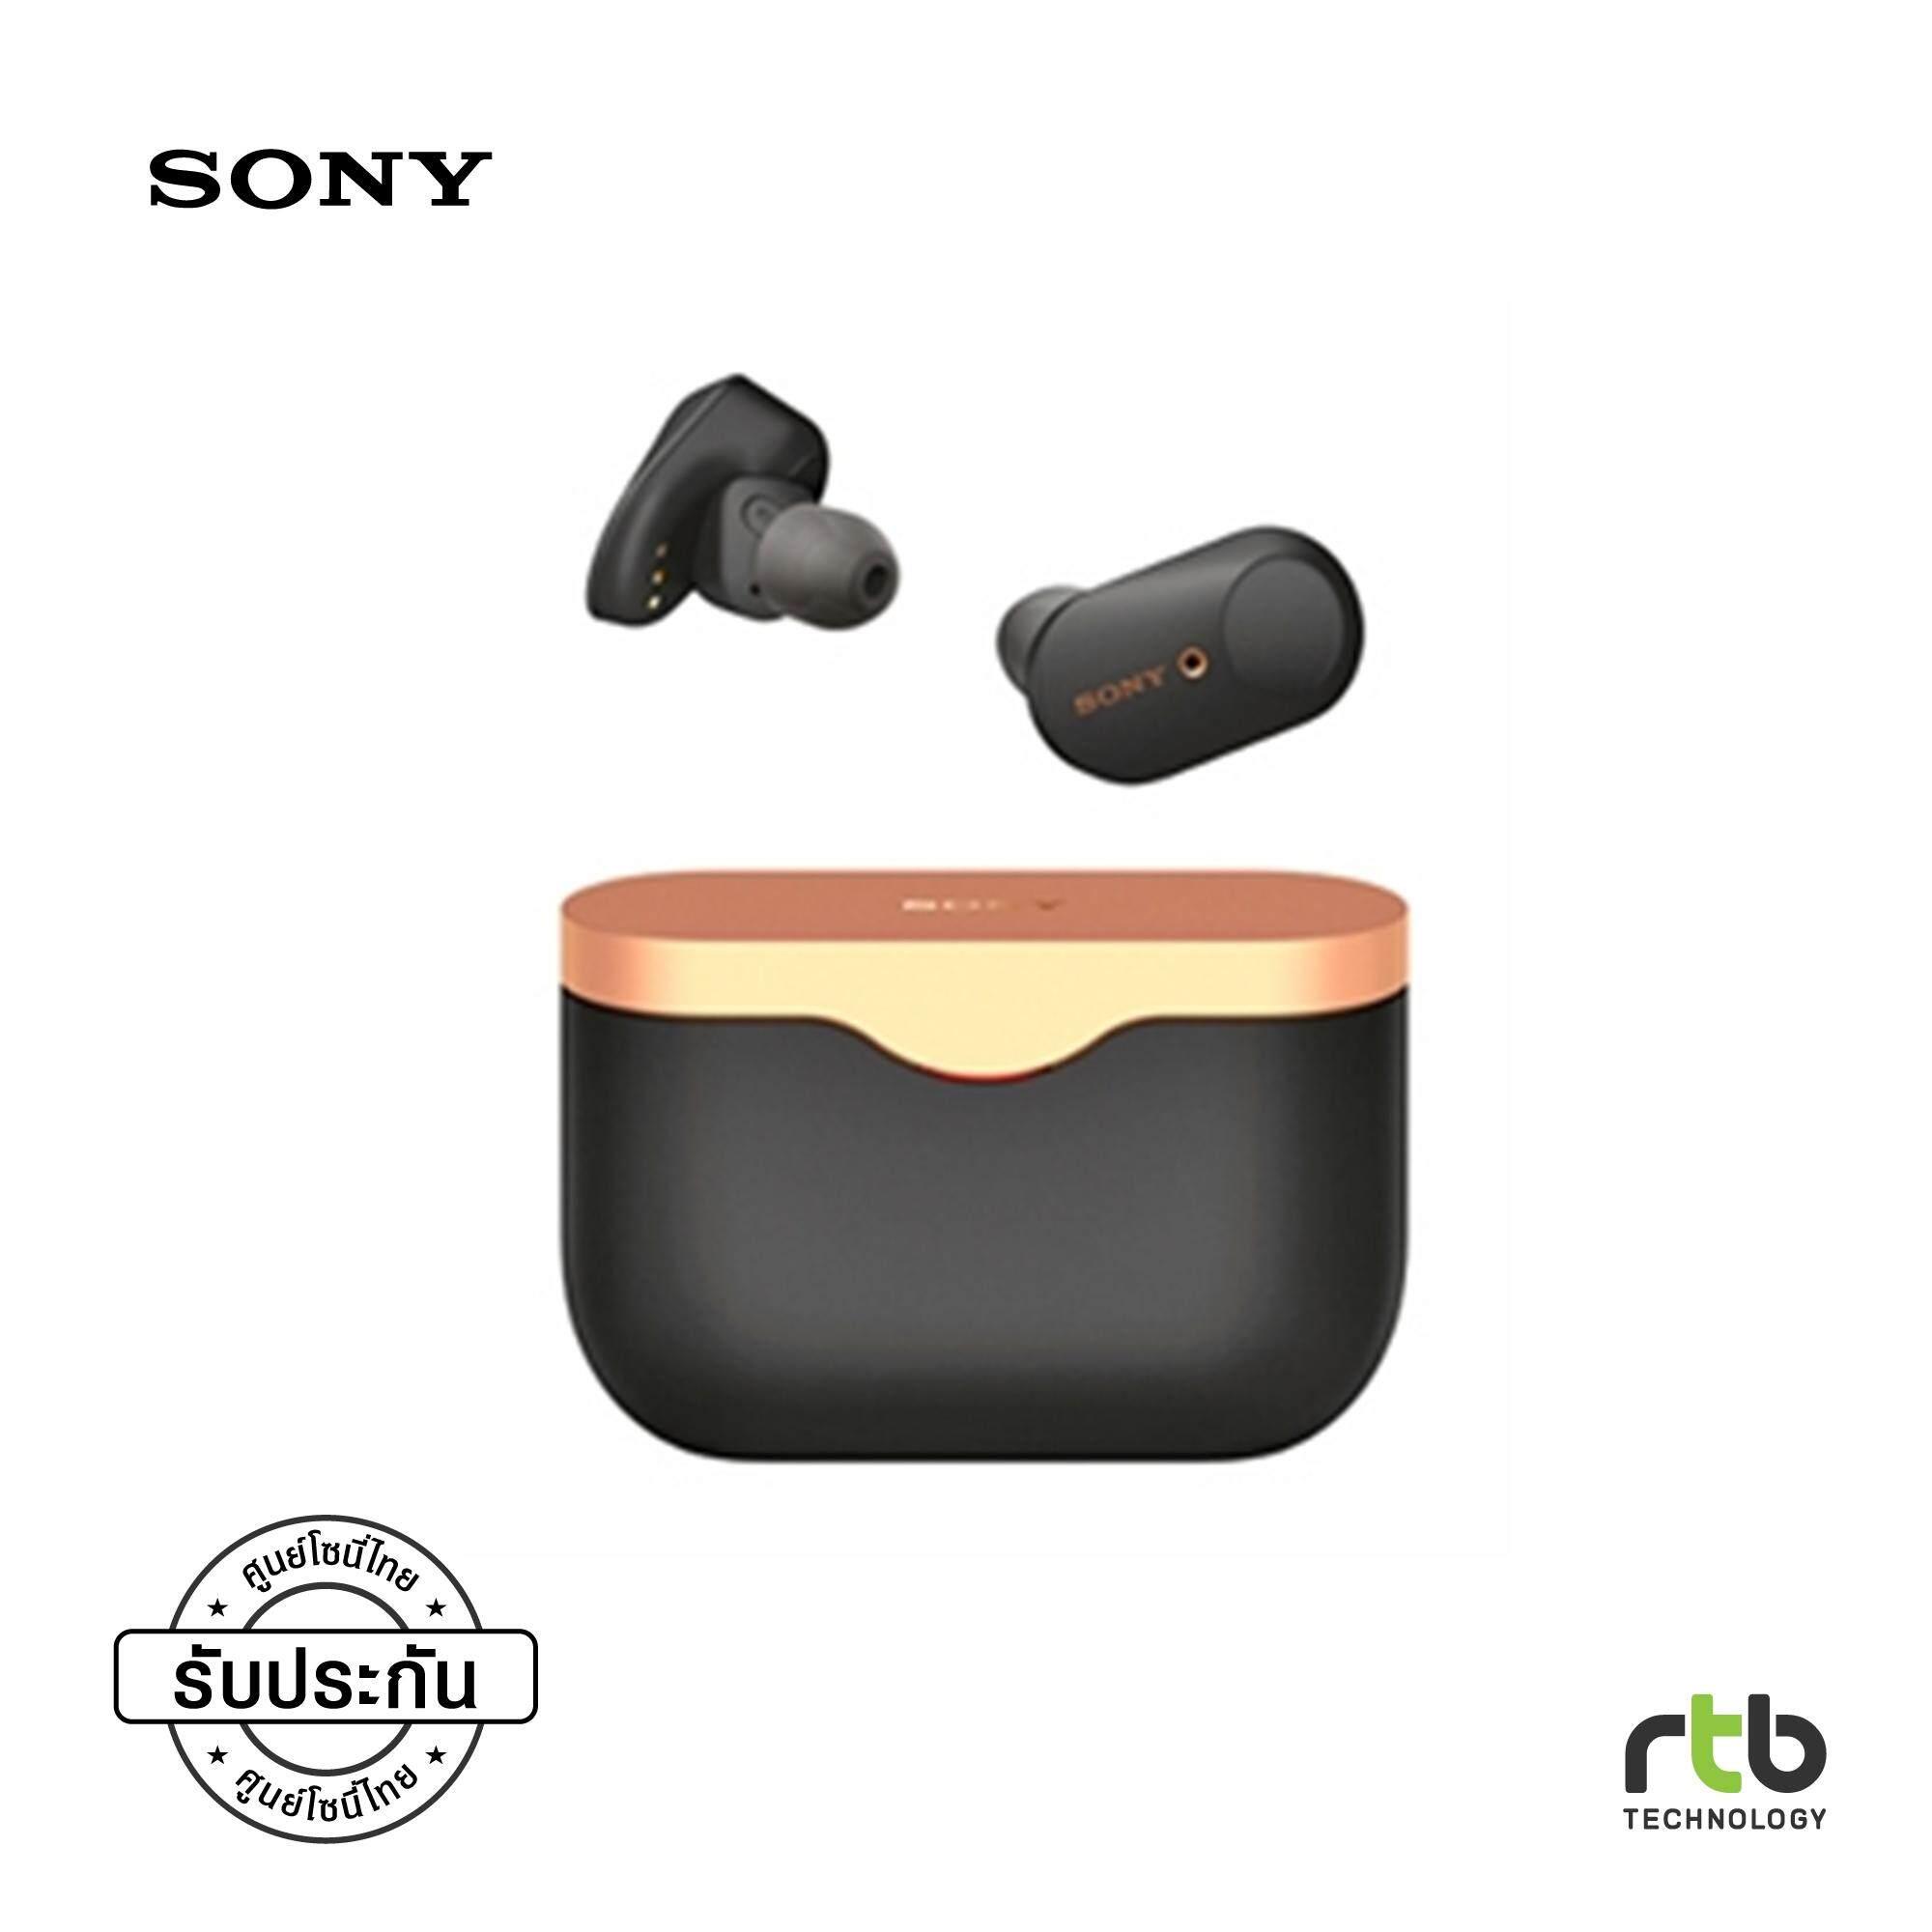 (Pre Order แถม Power Bank Sony ส่งสินค้าวันที่ 24 ก.ค.62) Sony หูฟัง ไร้สาย ตัดเสียงรบกวน รุ่น WF 1000XM3 - Black รีวิว sony wf-1000xm3 หูฟังไร้สาย true wireless ที่ครบเครื่องในการใช้งานประจำวัน - รีวิว Sony WF-1000XM3 หูฟังไร้สาย True Wireless ตัดเสียงเงียกริบ ครบเครื่องสุดๆ ในการใช้งานประจำวัน